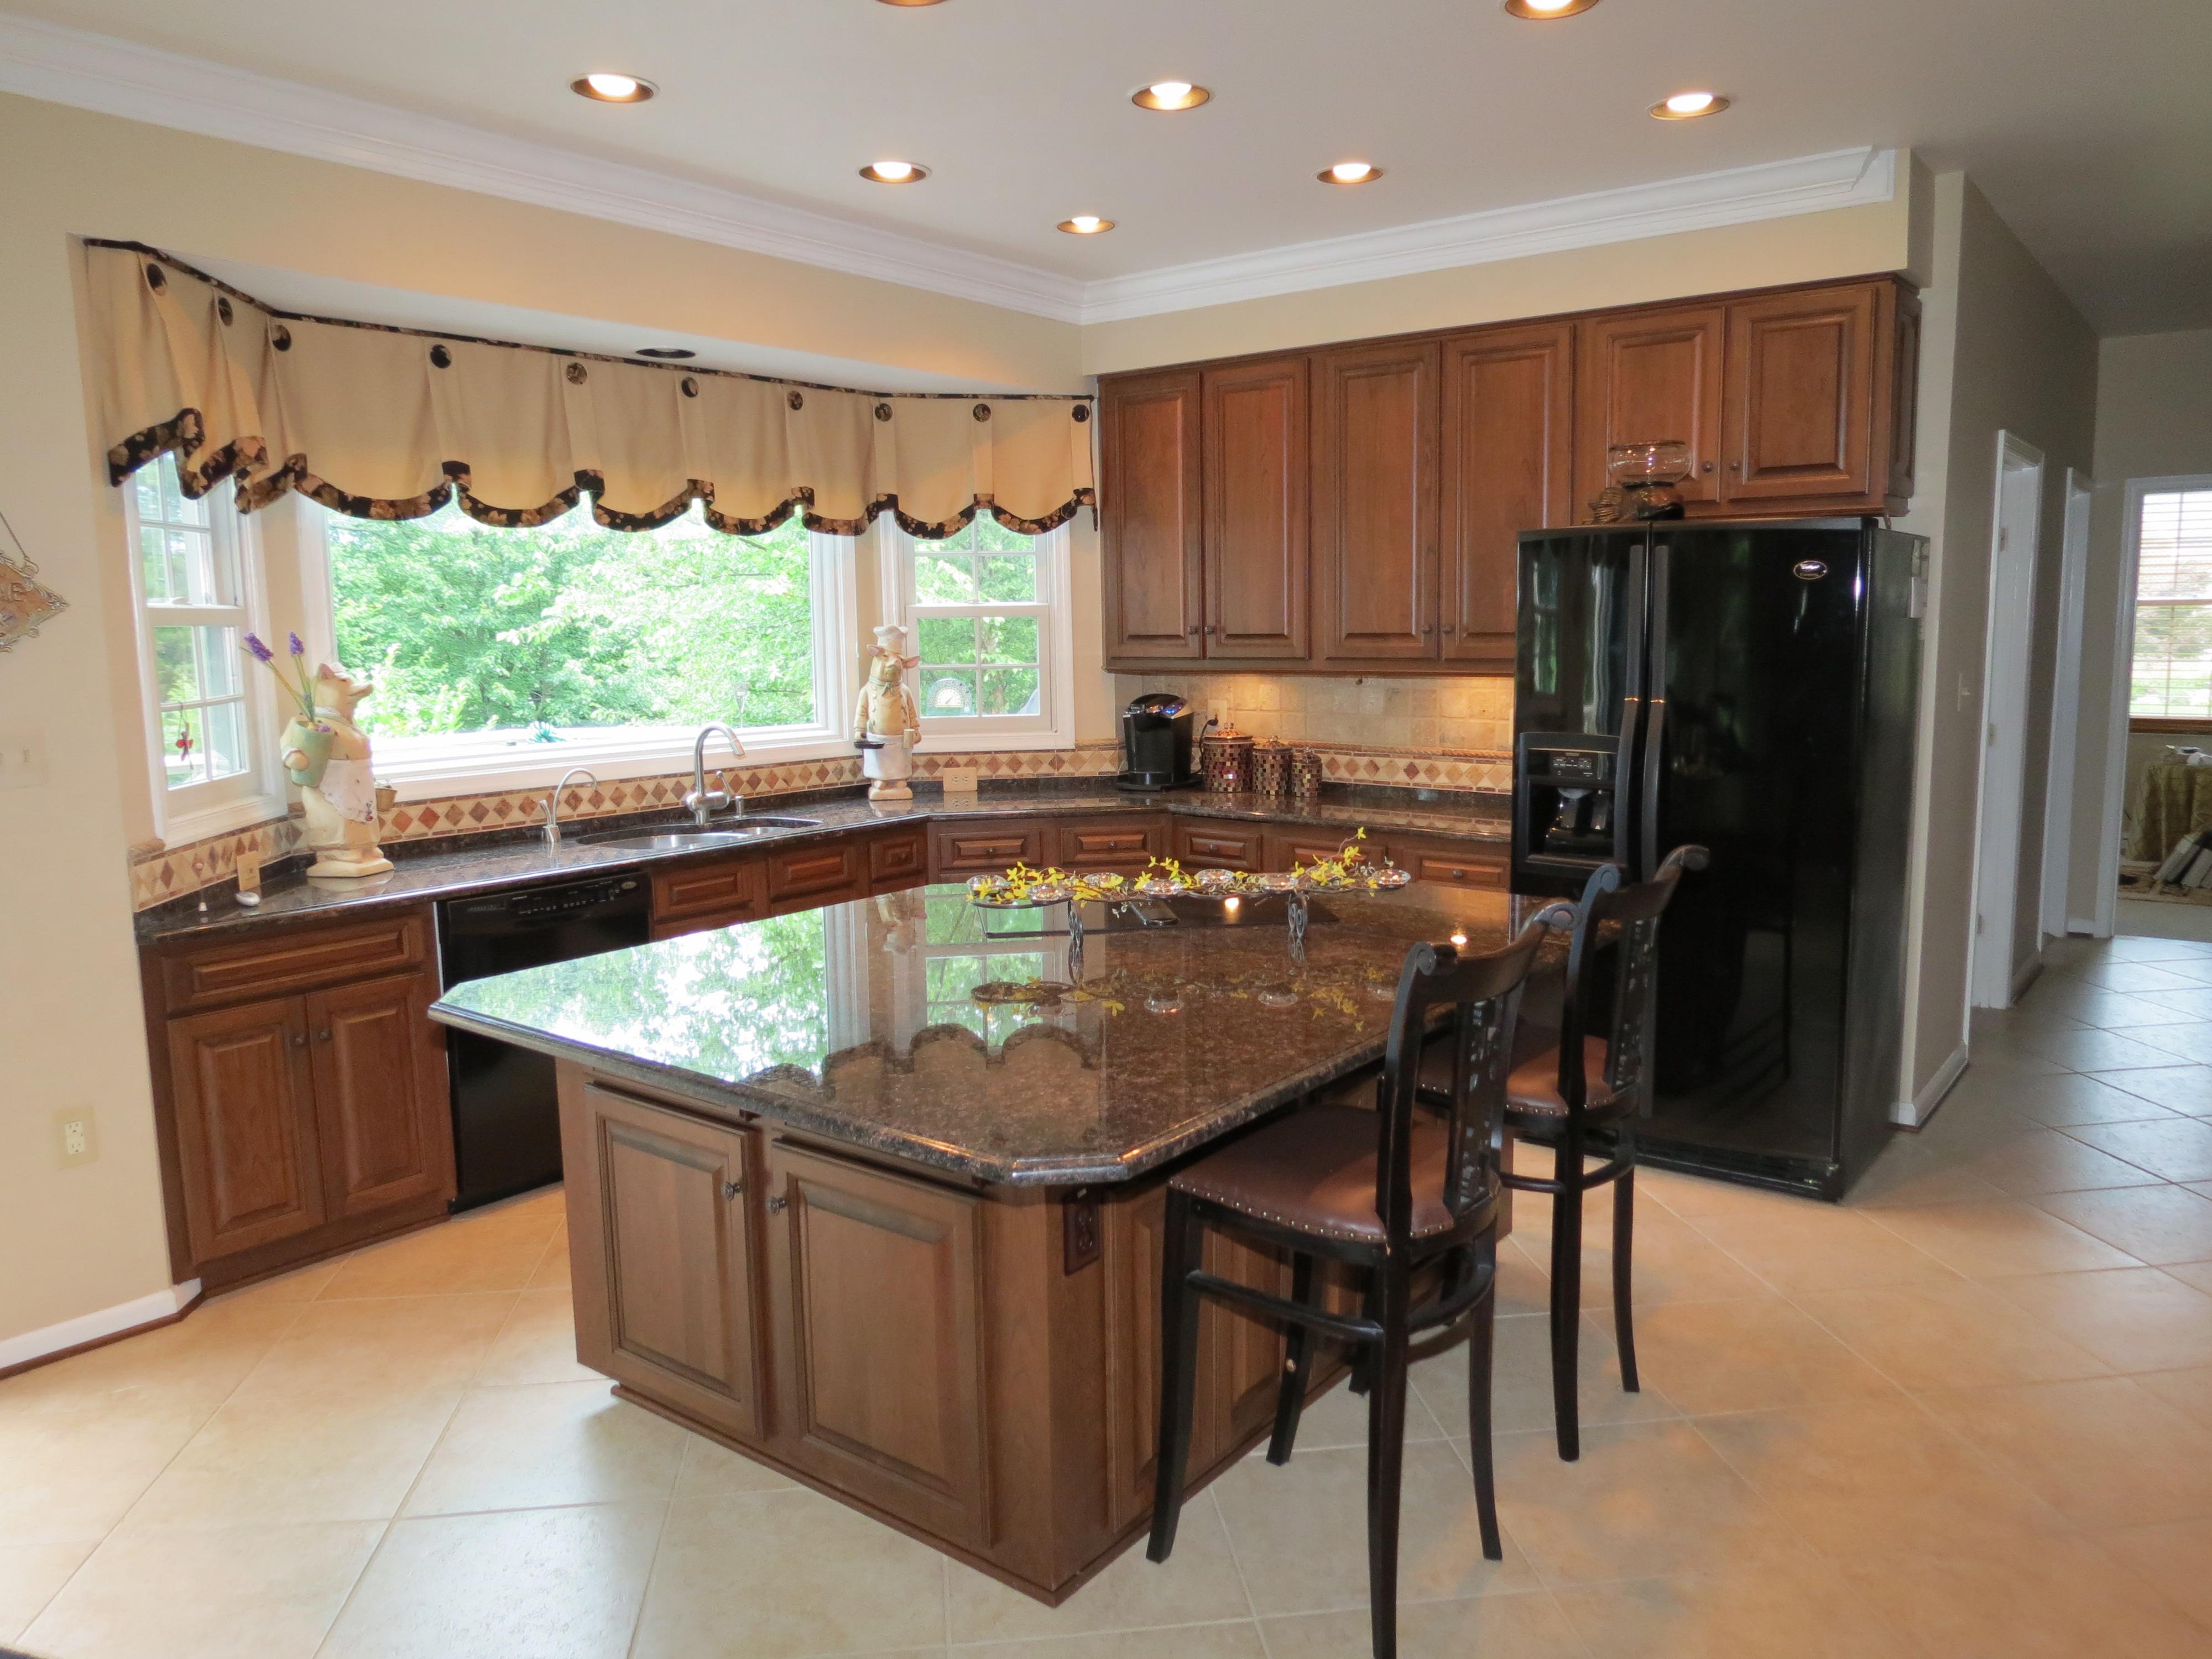 Kitchen Solvers Frederick Md 21702 Yp Com